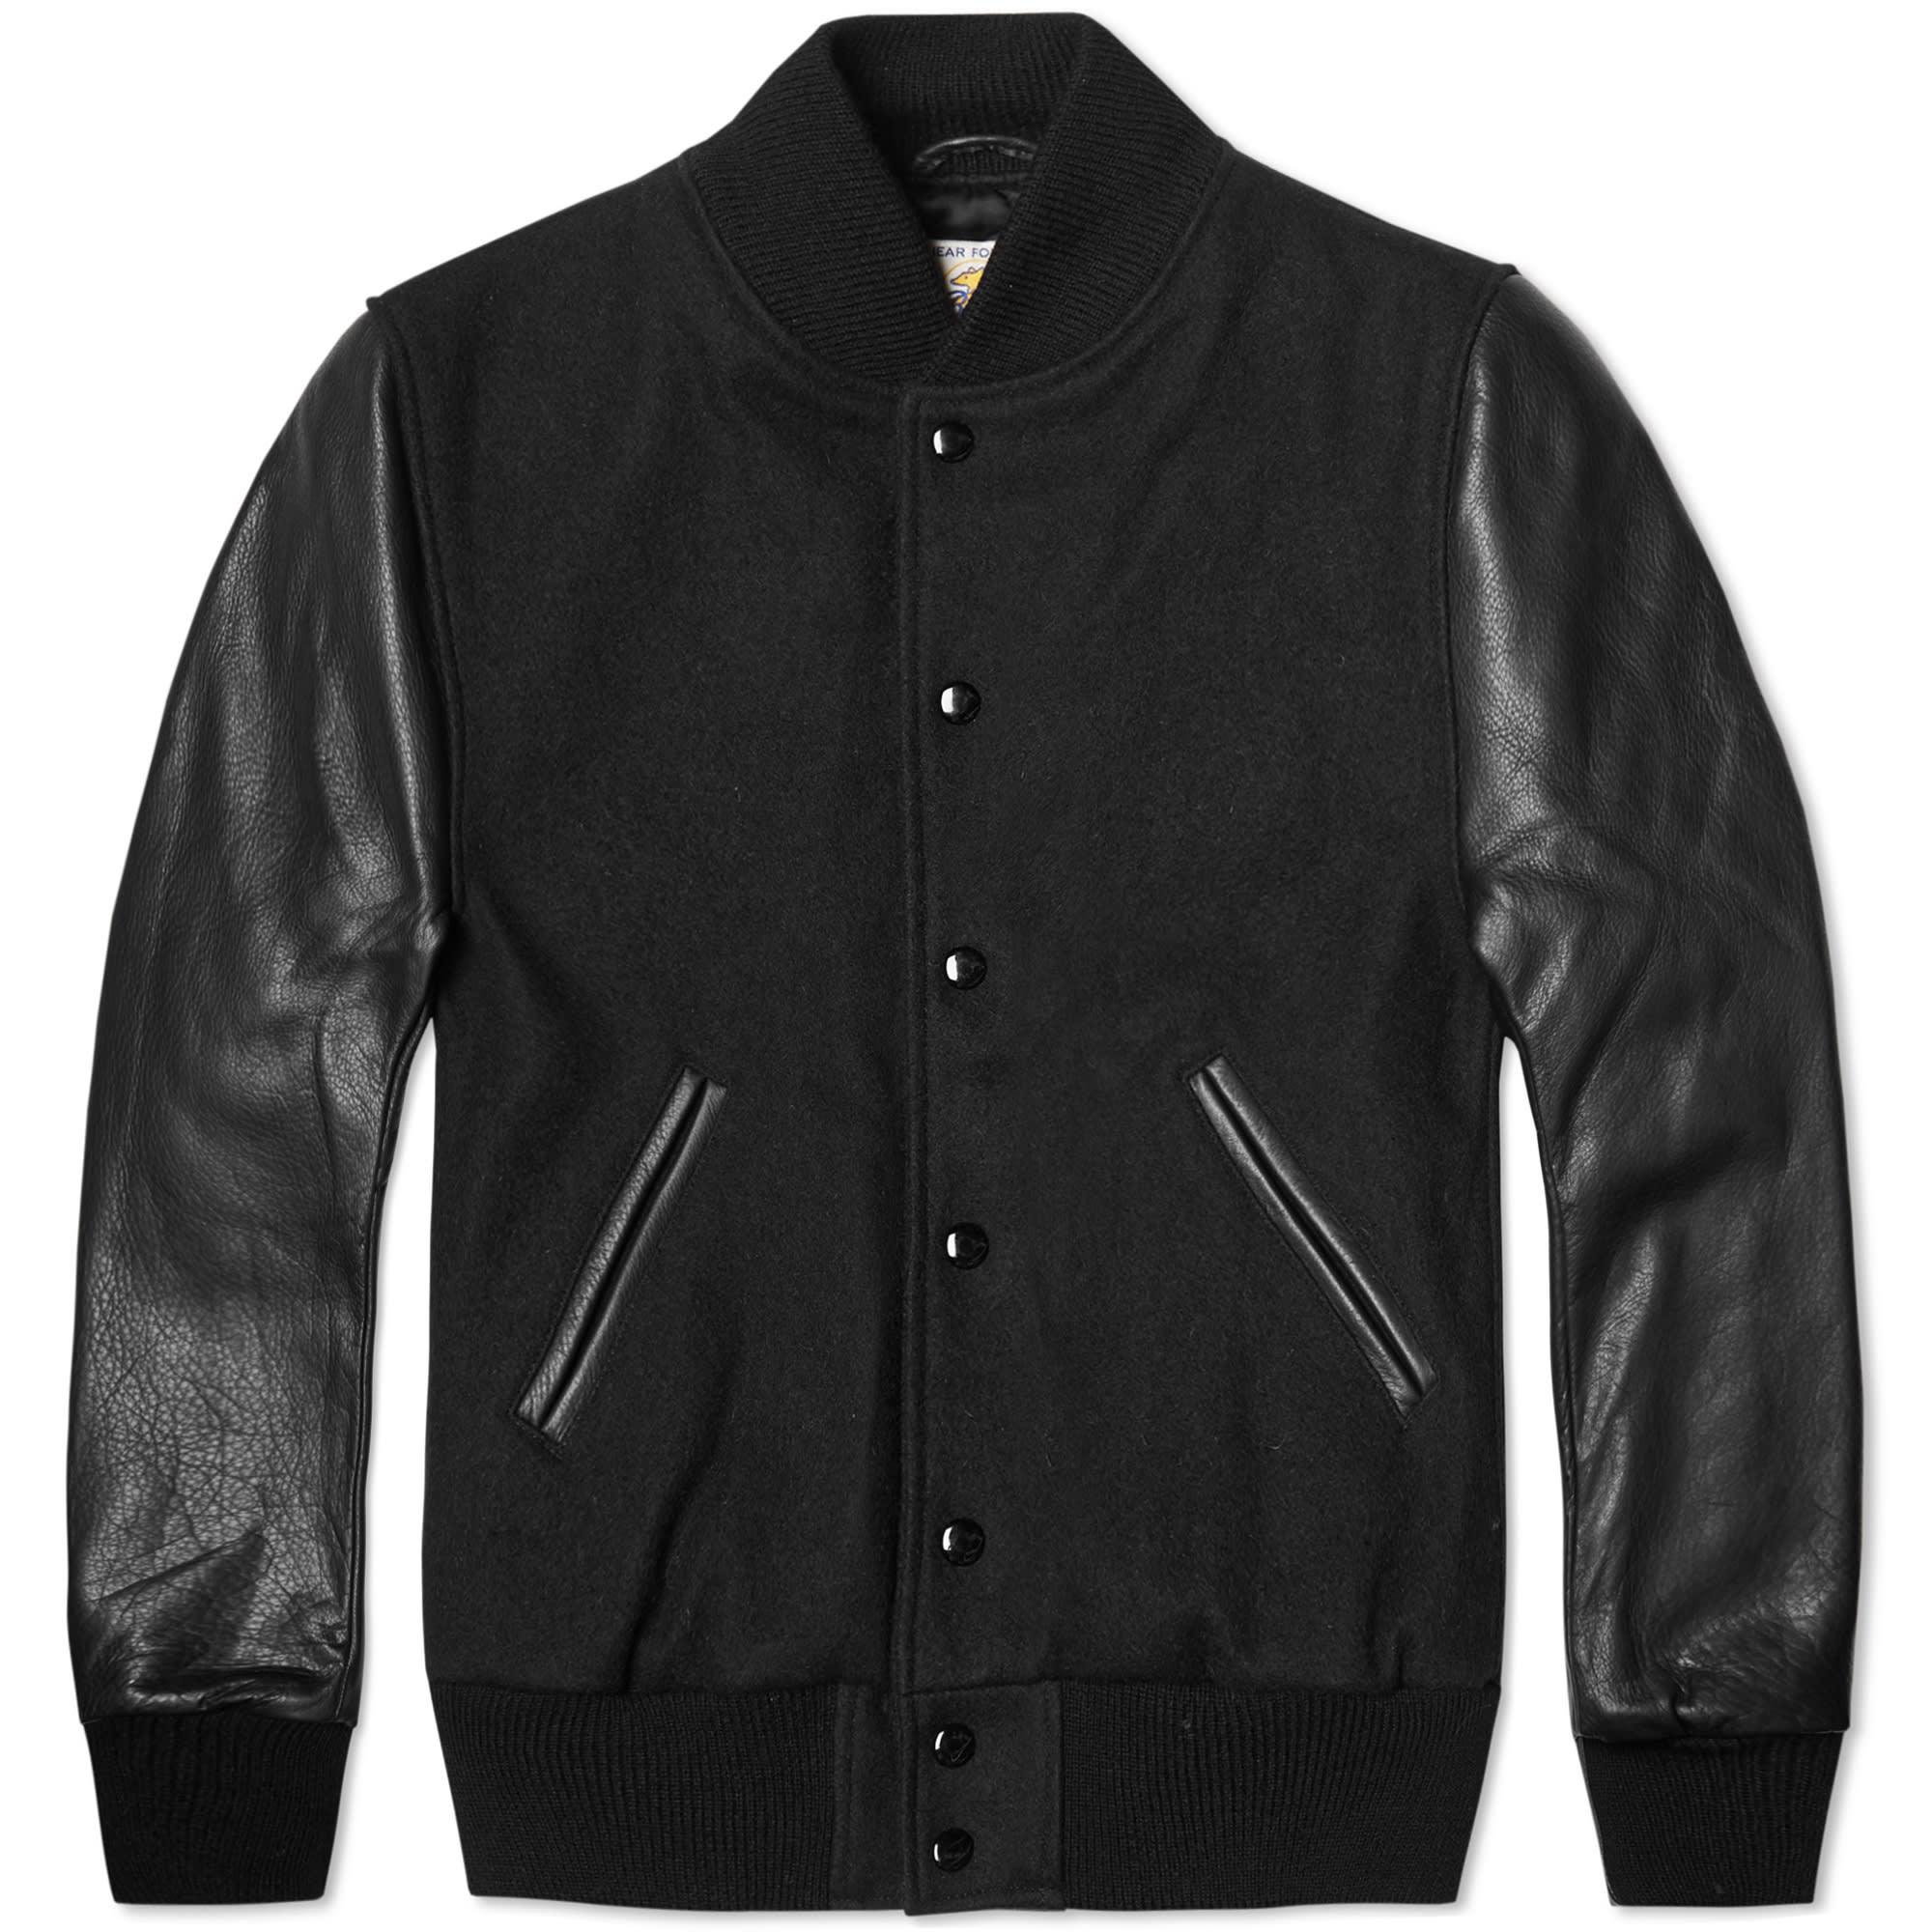 Leather wool varsity jacket